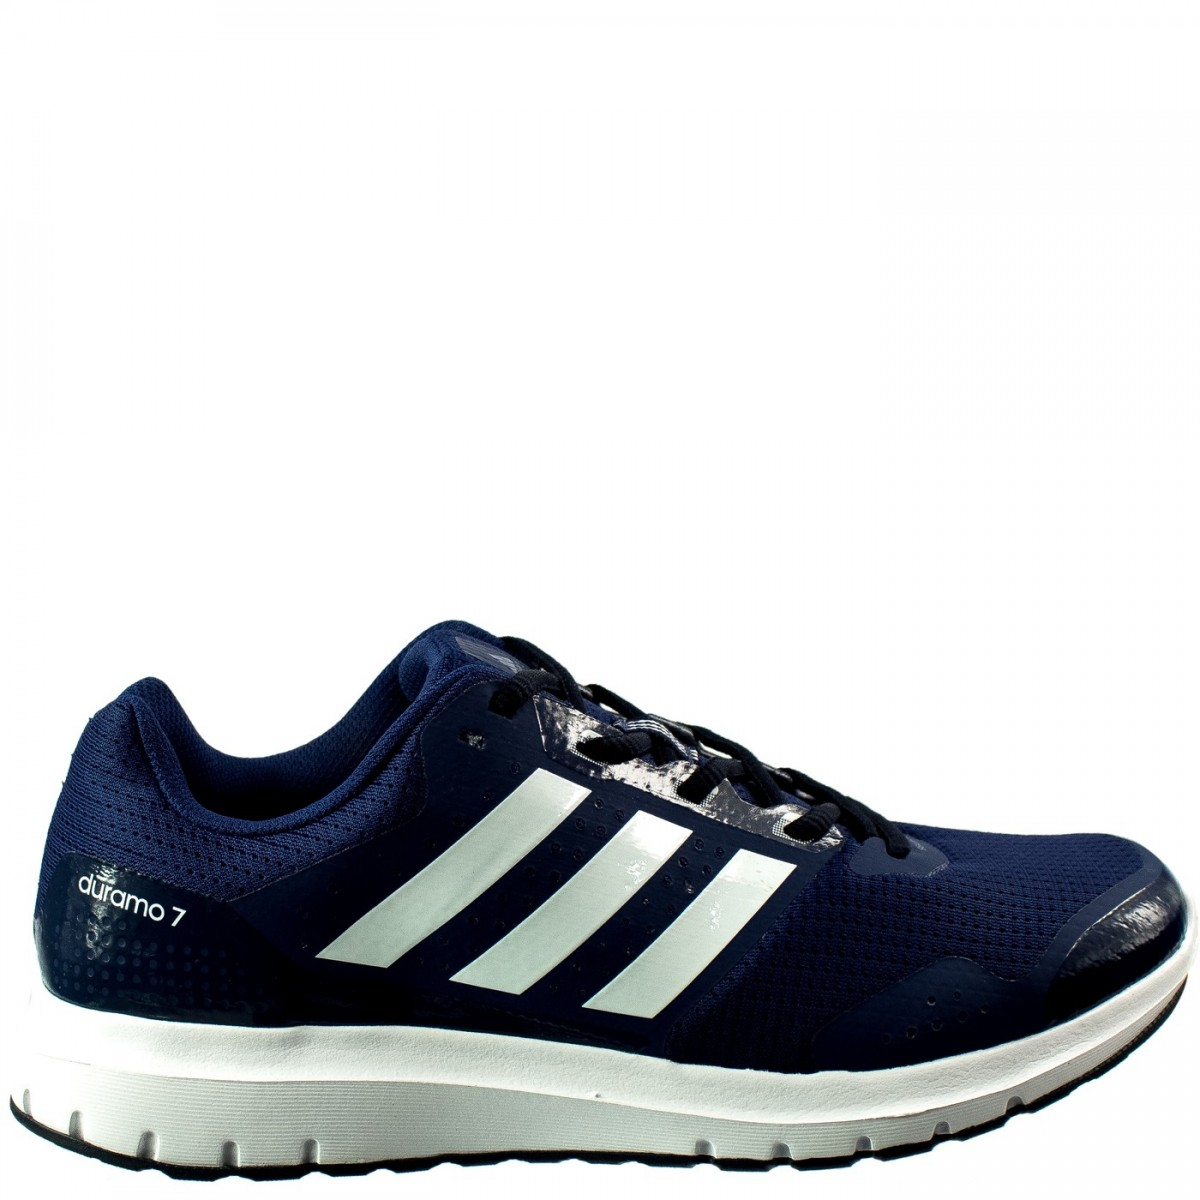 850ad3dfc93 Bizz Store - Tênis Masculino Adidas Duramo 7 Corrida